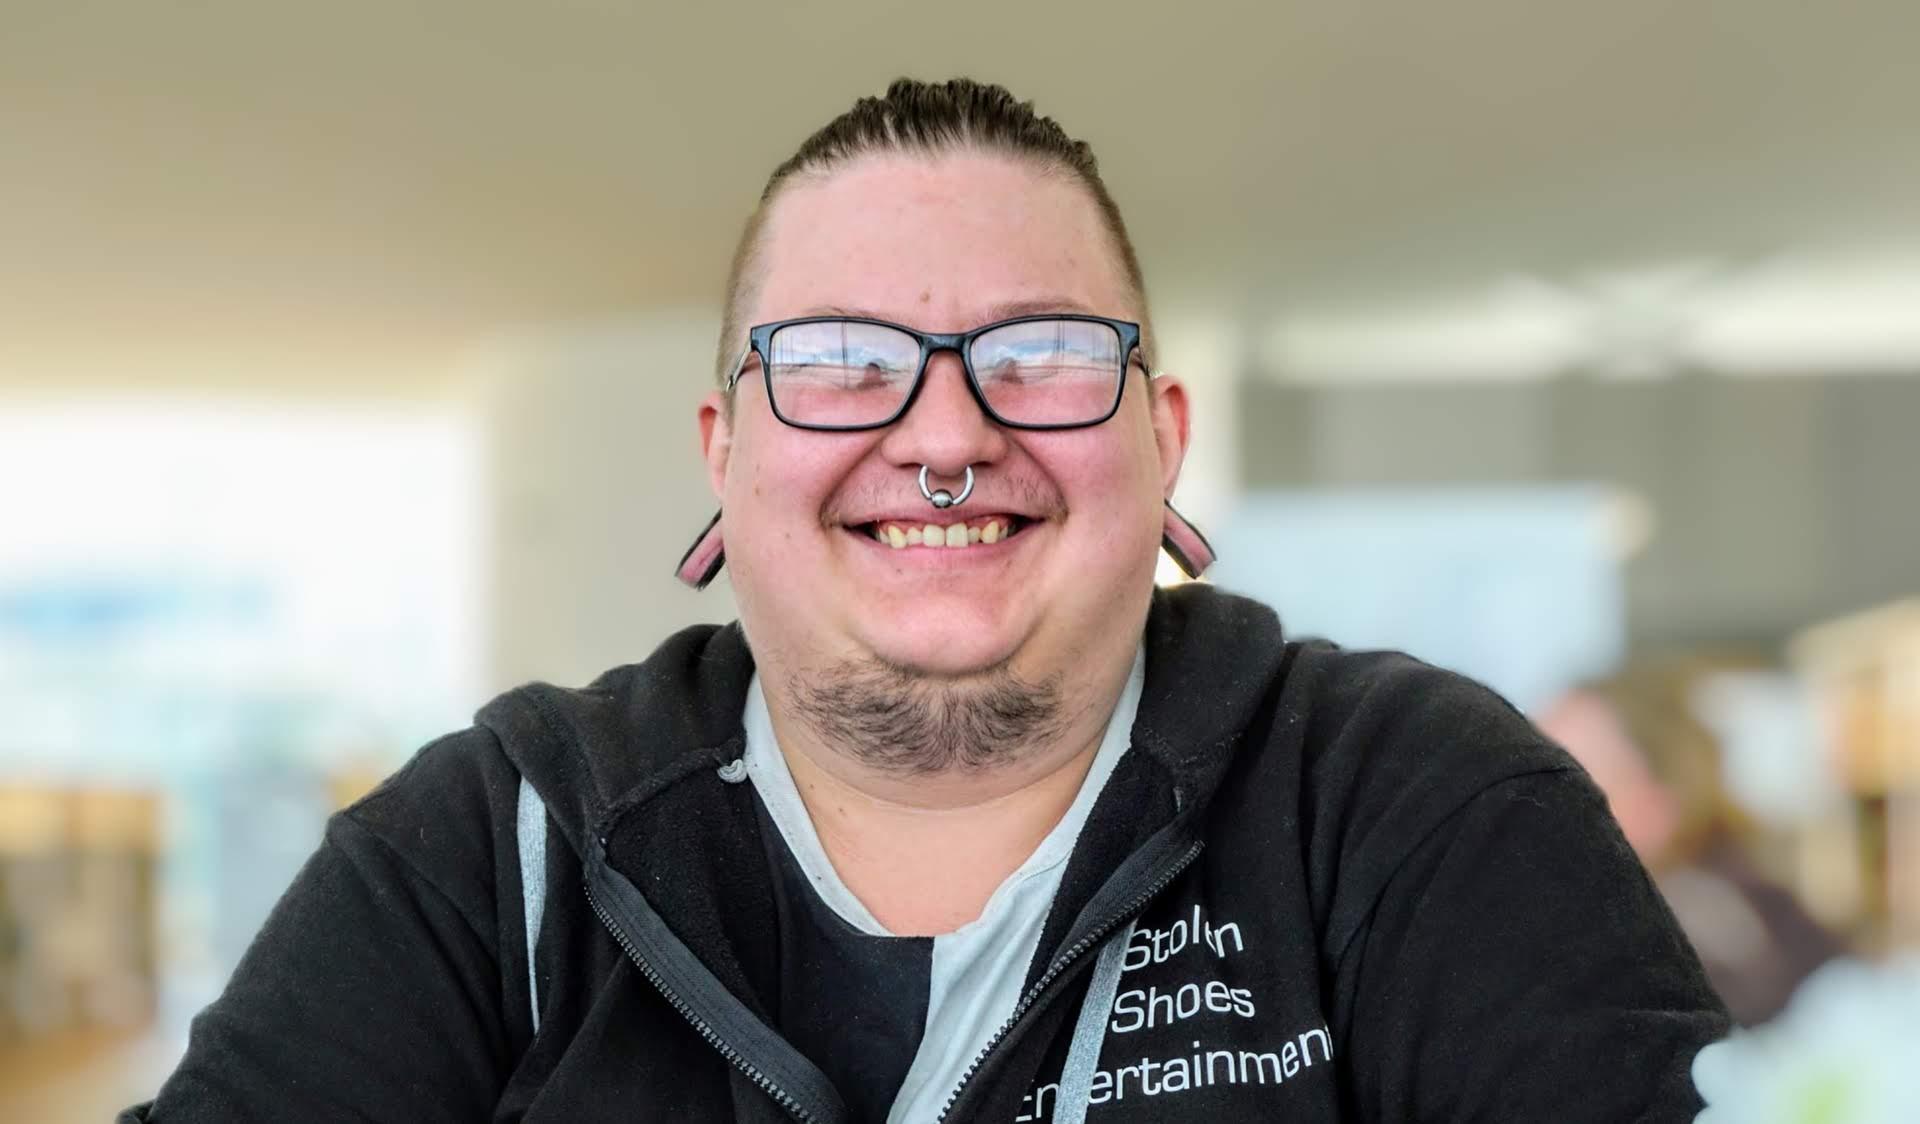 Miikka Sipila Stolen Shoes Entertainment Streamize Gaming Industry Entrepreneurs of Finland Jyvaskyla Co founder gamer 2